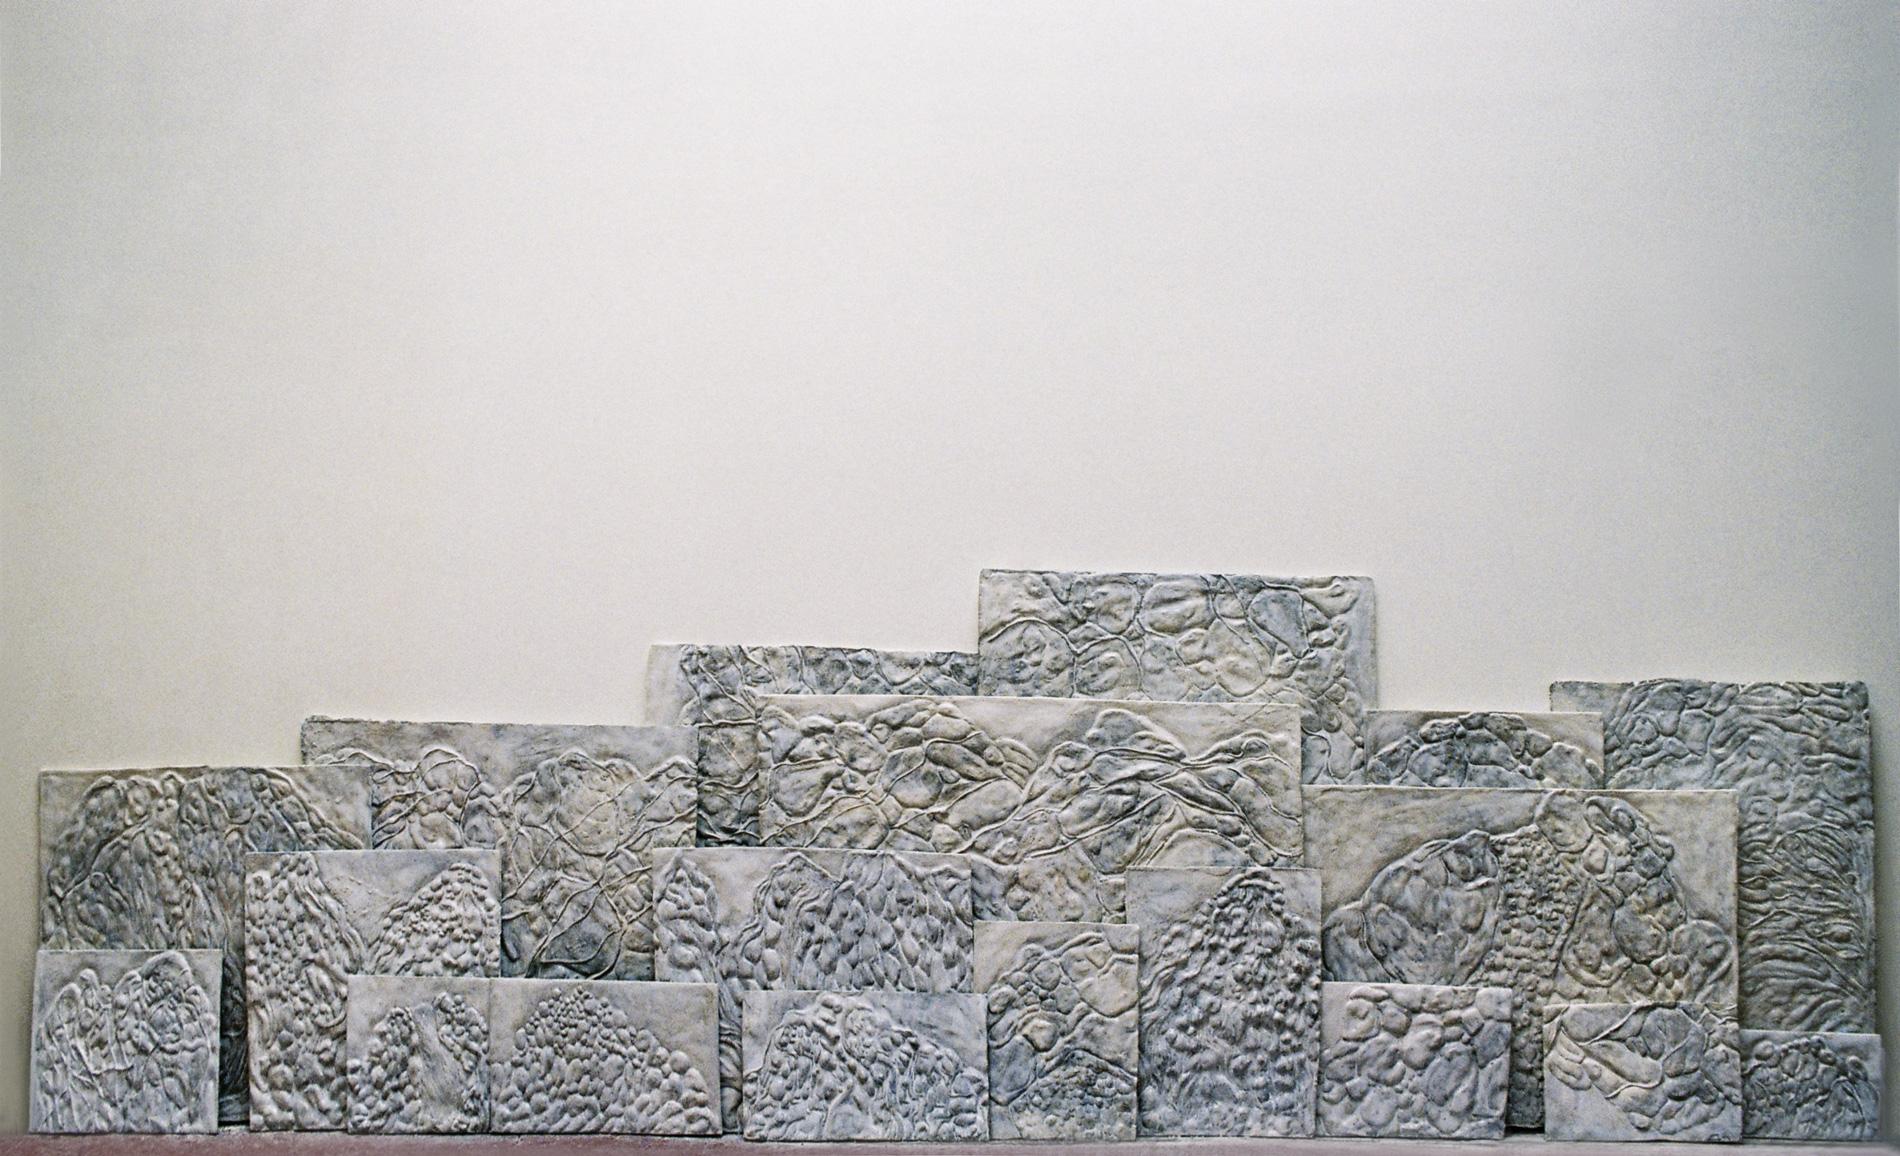 Bas-reliefs1